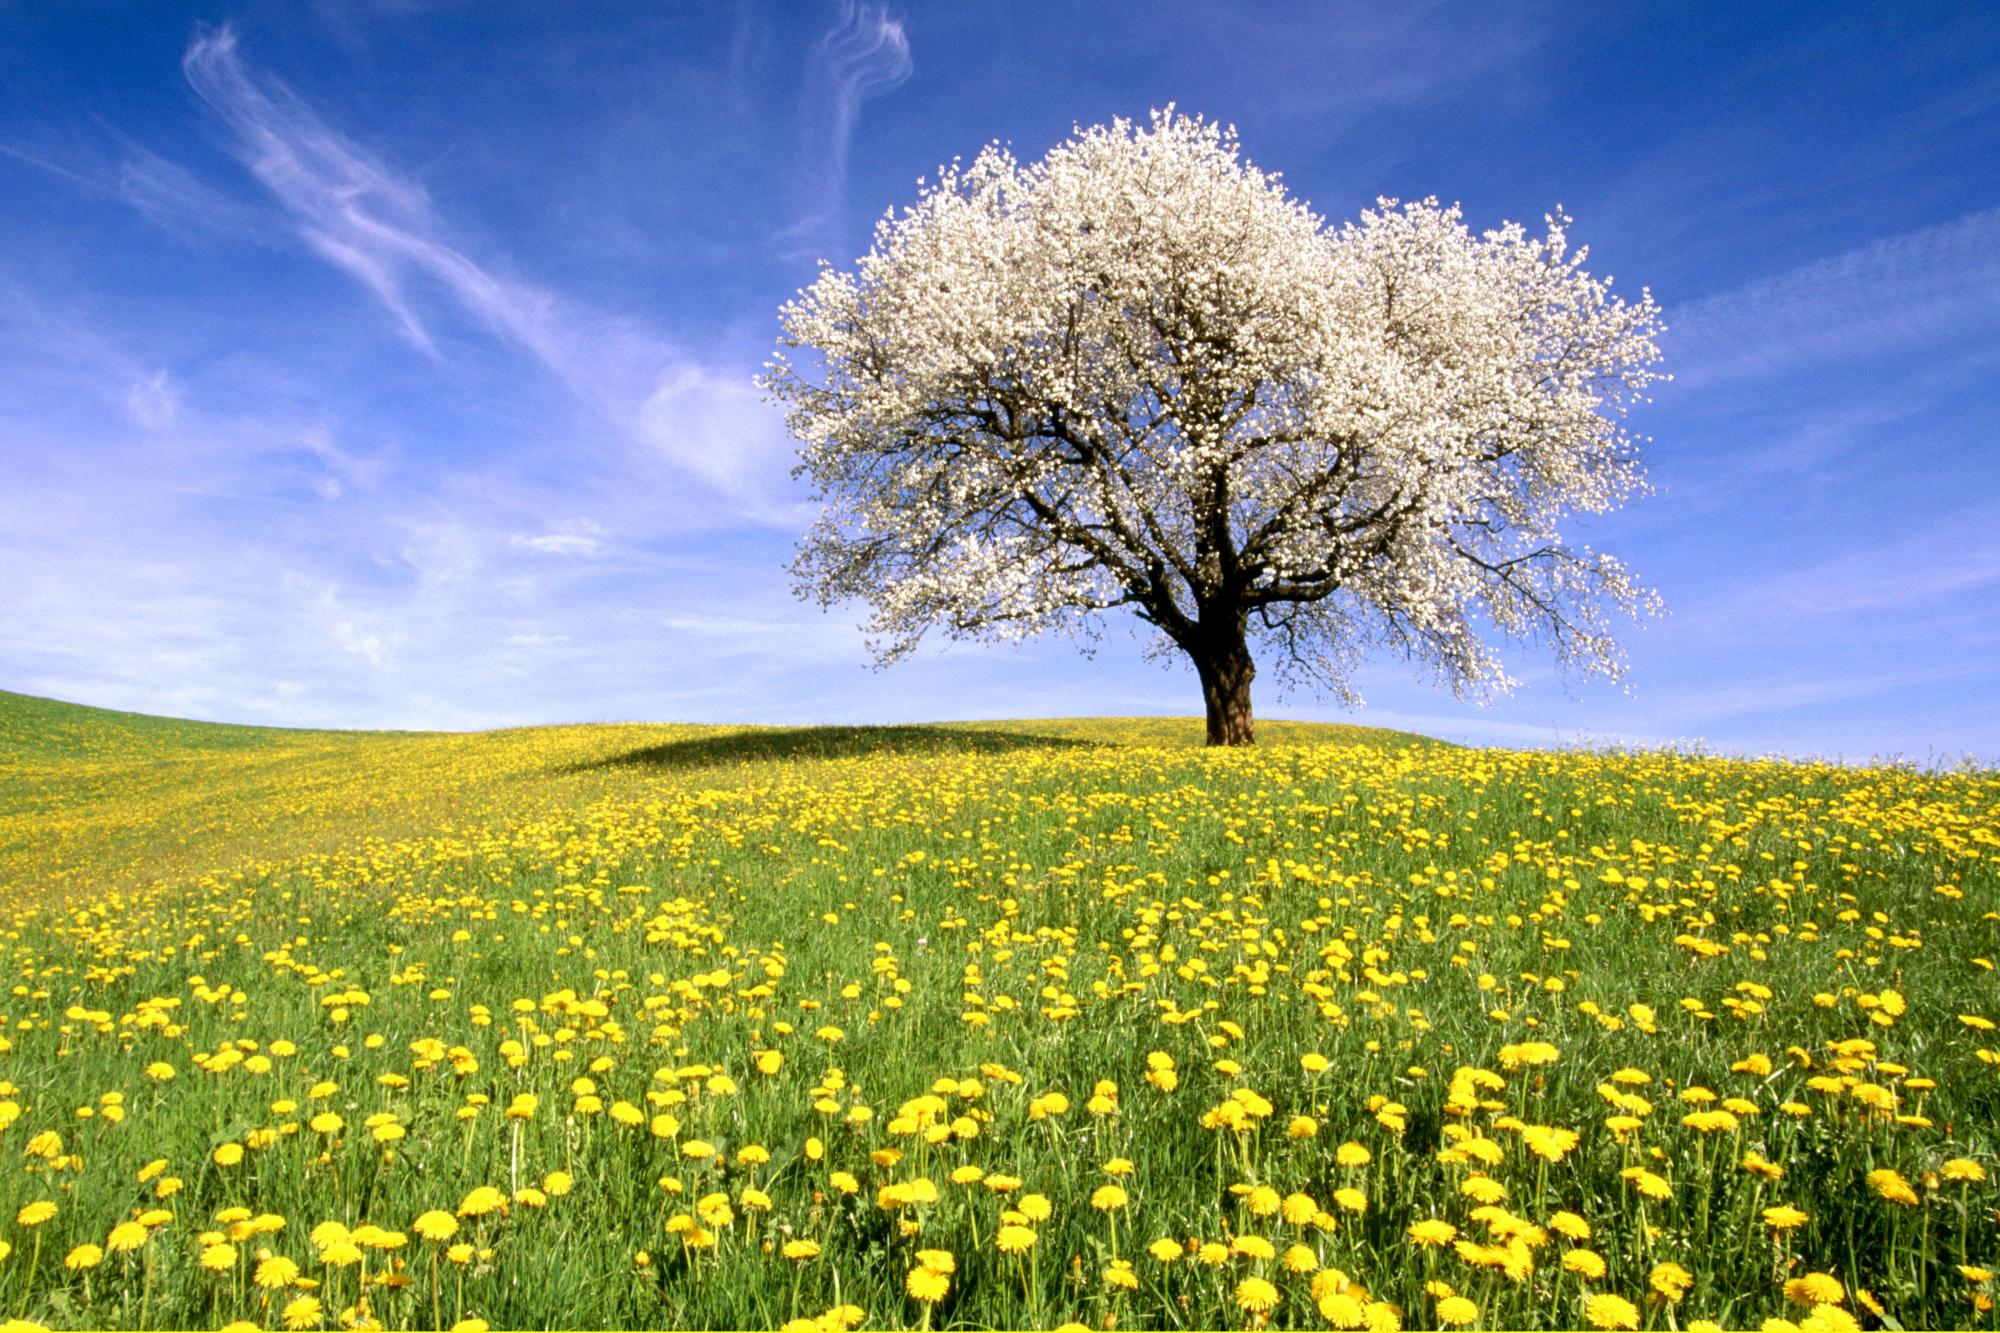 Flowers Photos Roopretelcham 멋진 풍경 바탕화면